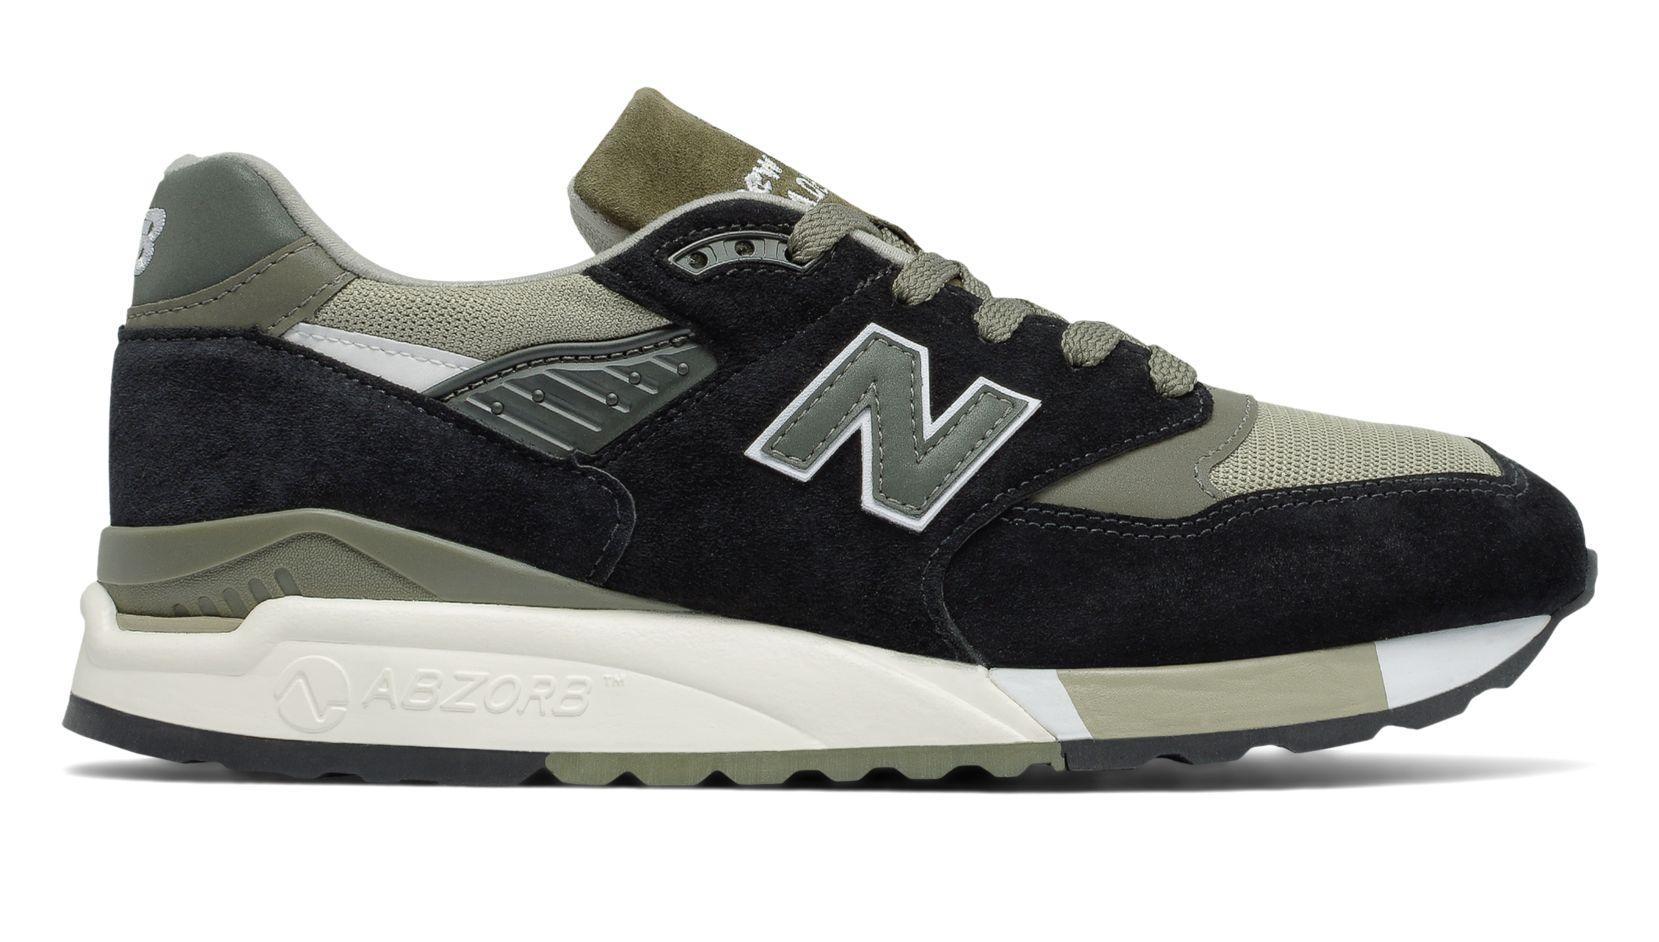 NB 998 Suede, Black with Sage